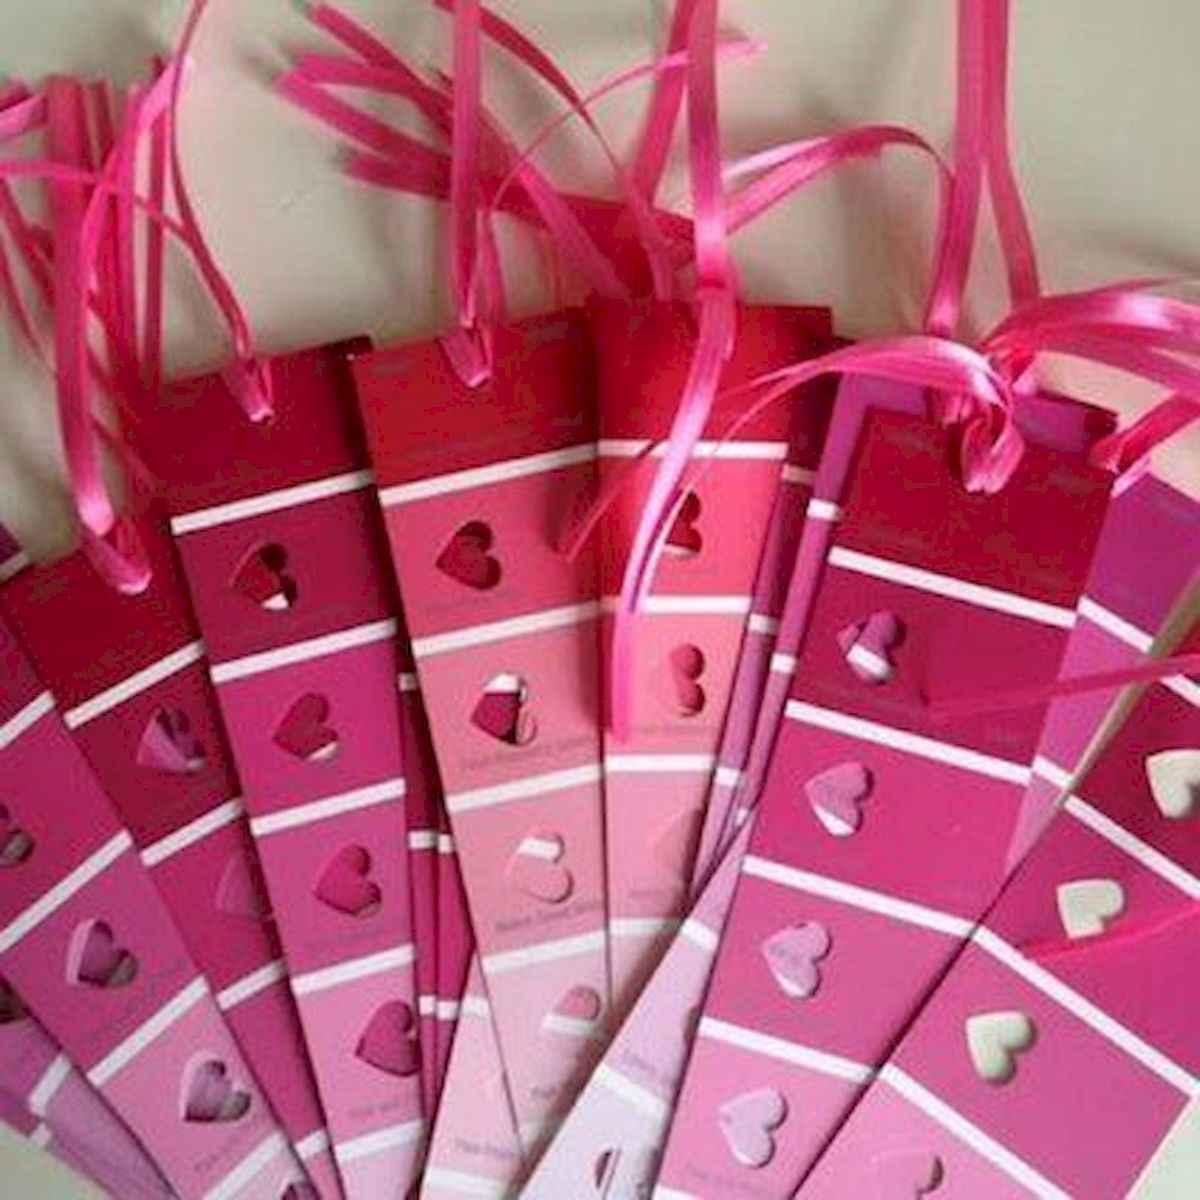 75 lovely valentines day crafts design ideas (4)